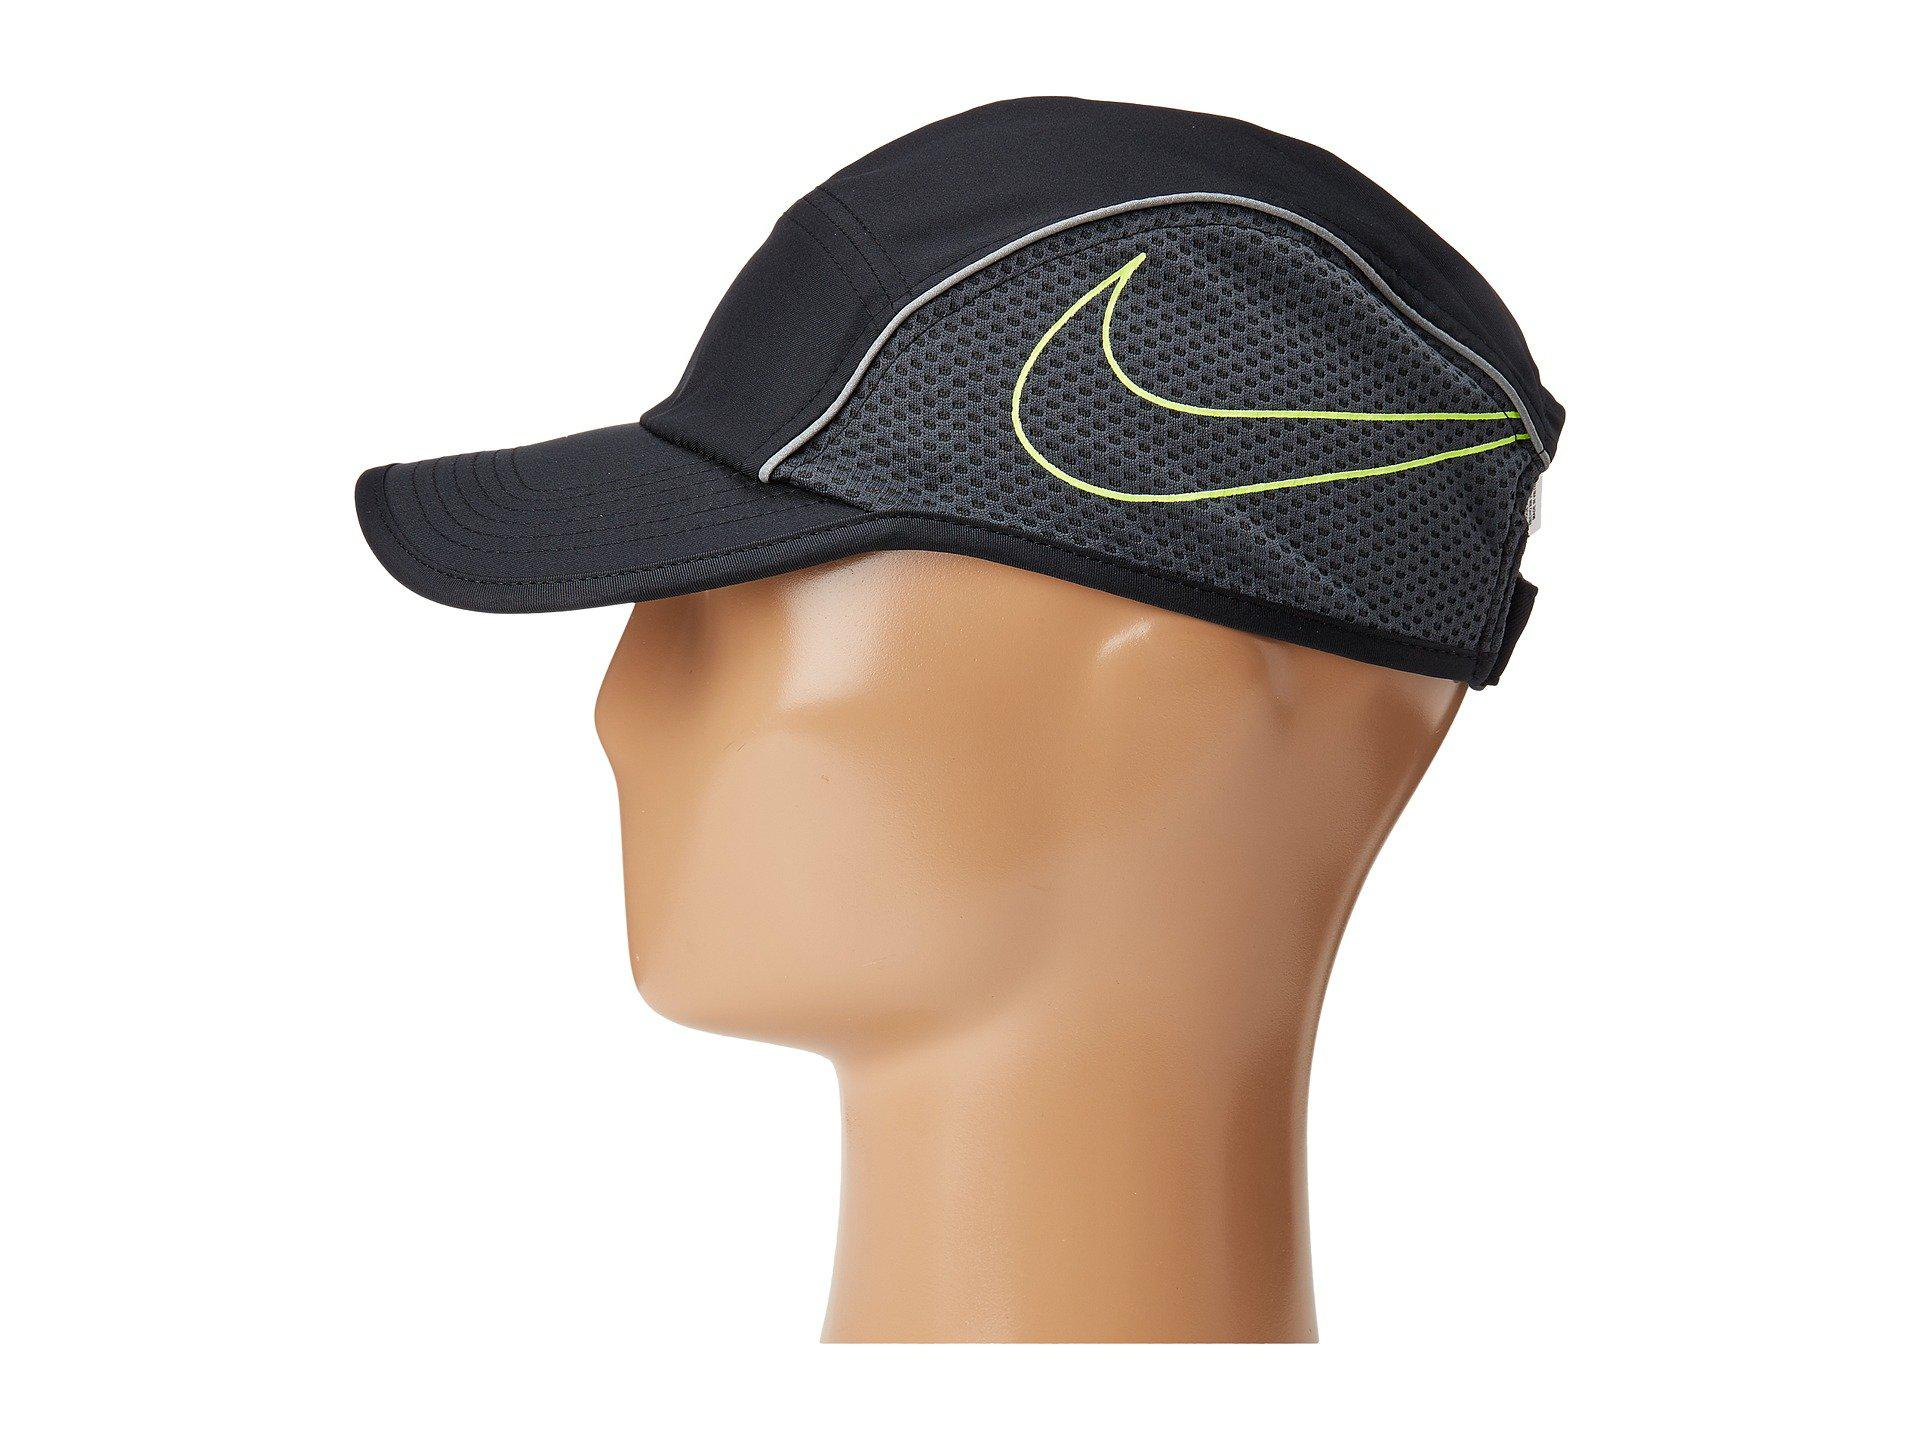 c5cefb10939cb Lyst - Nike Aerobill Aw84 Running Cap in Black for Men